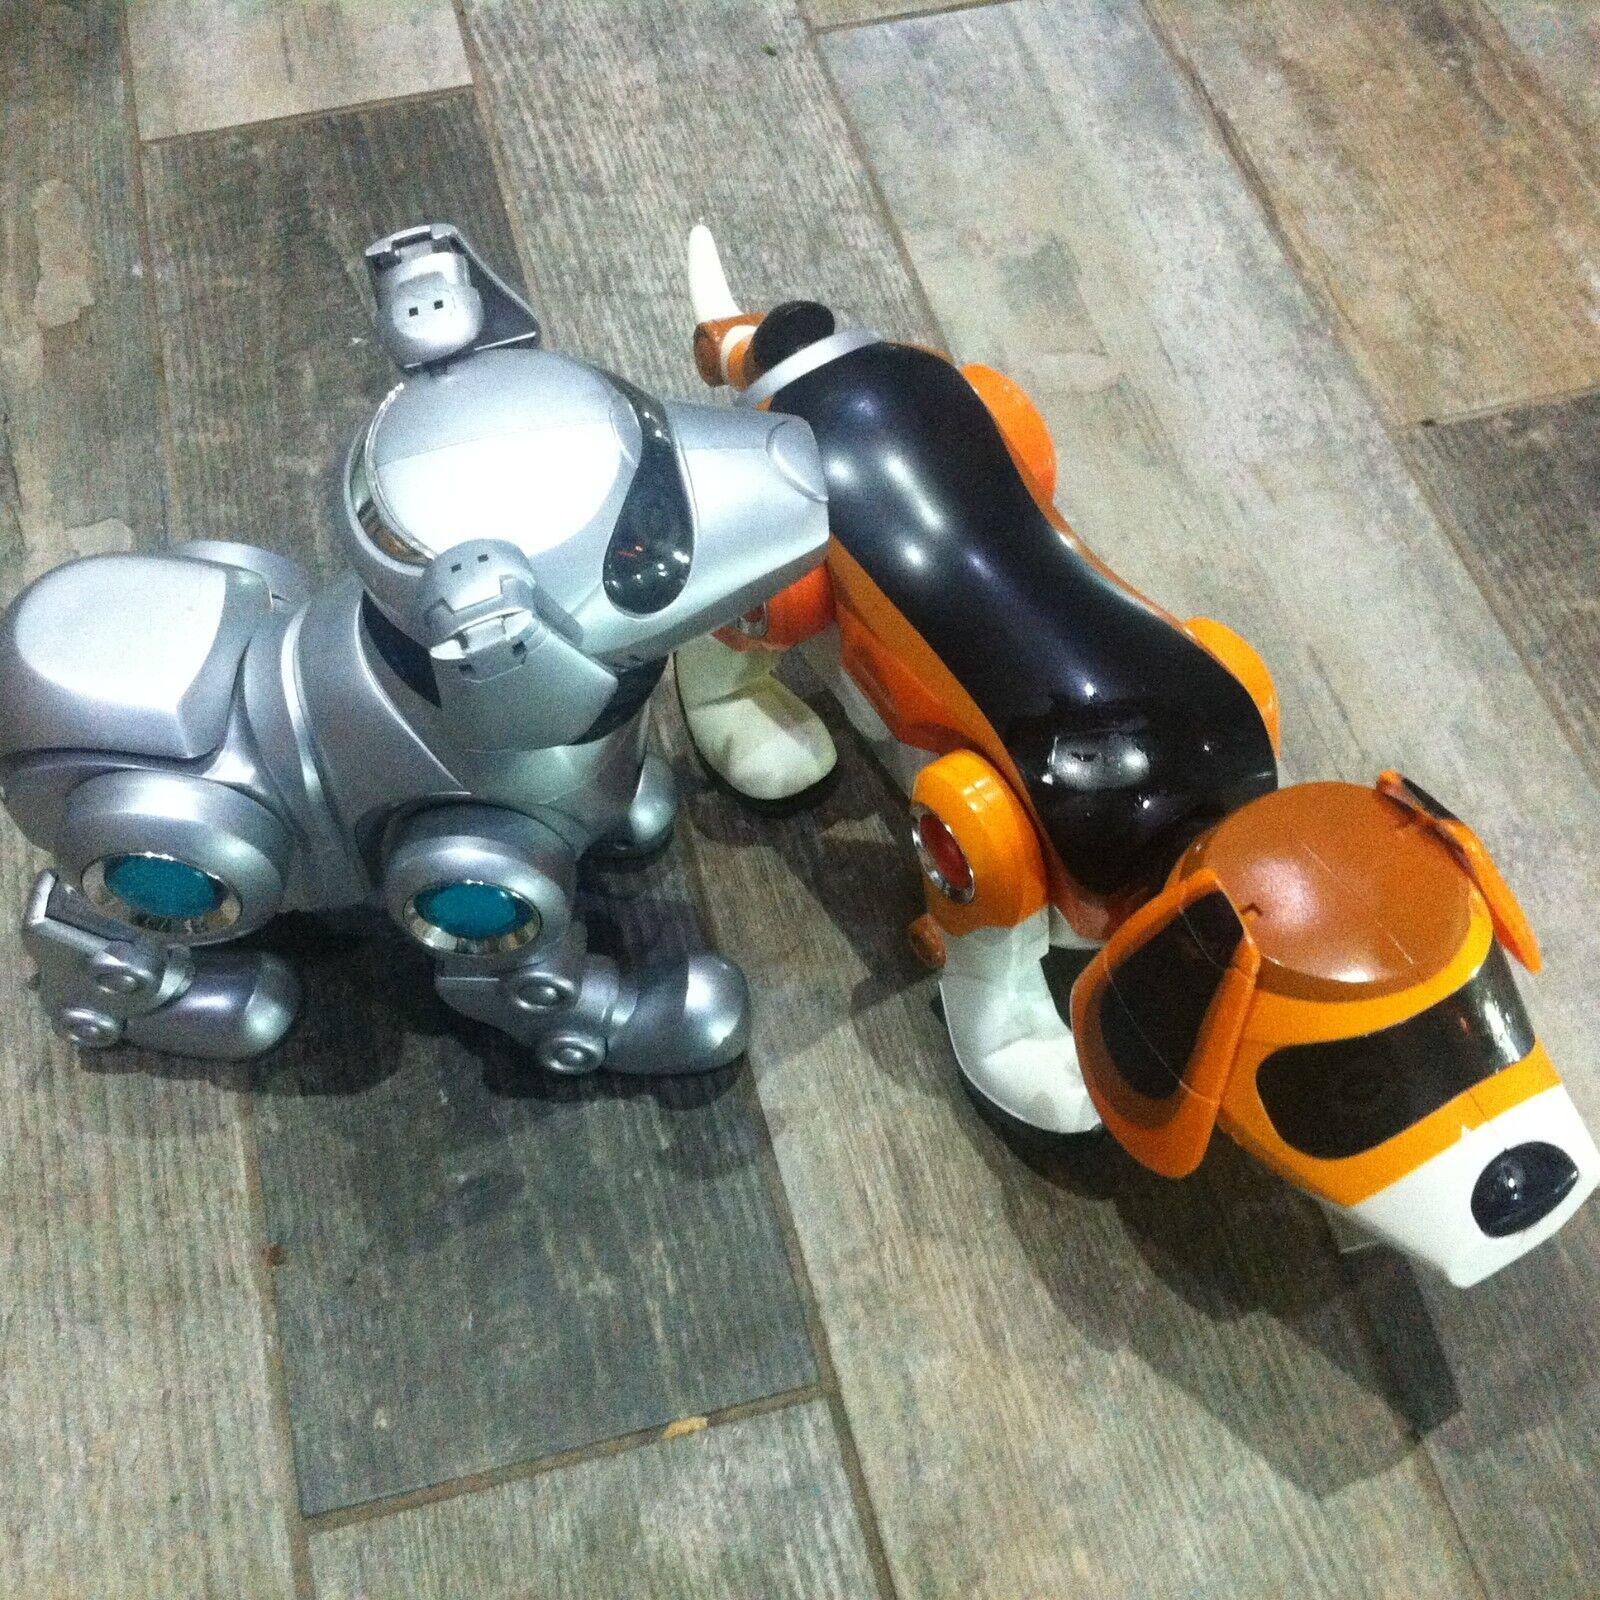 2 x Teksta robot dogs